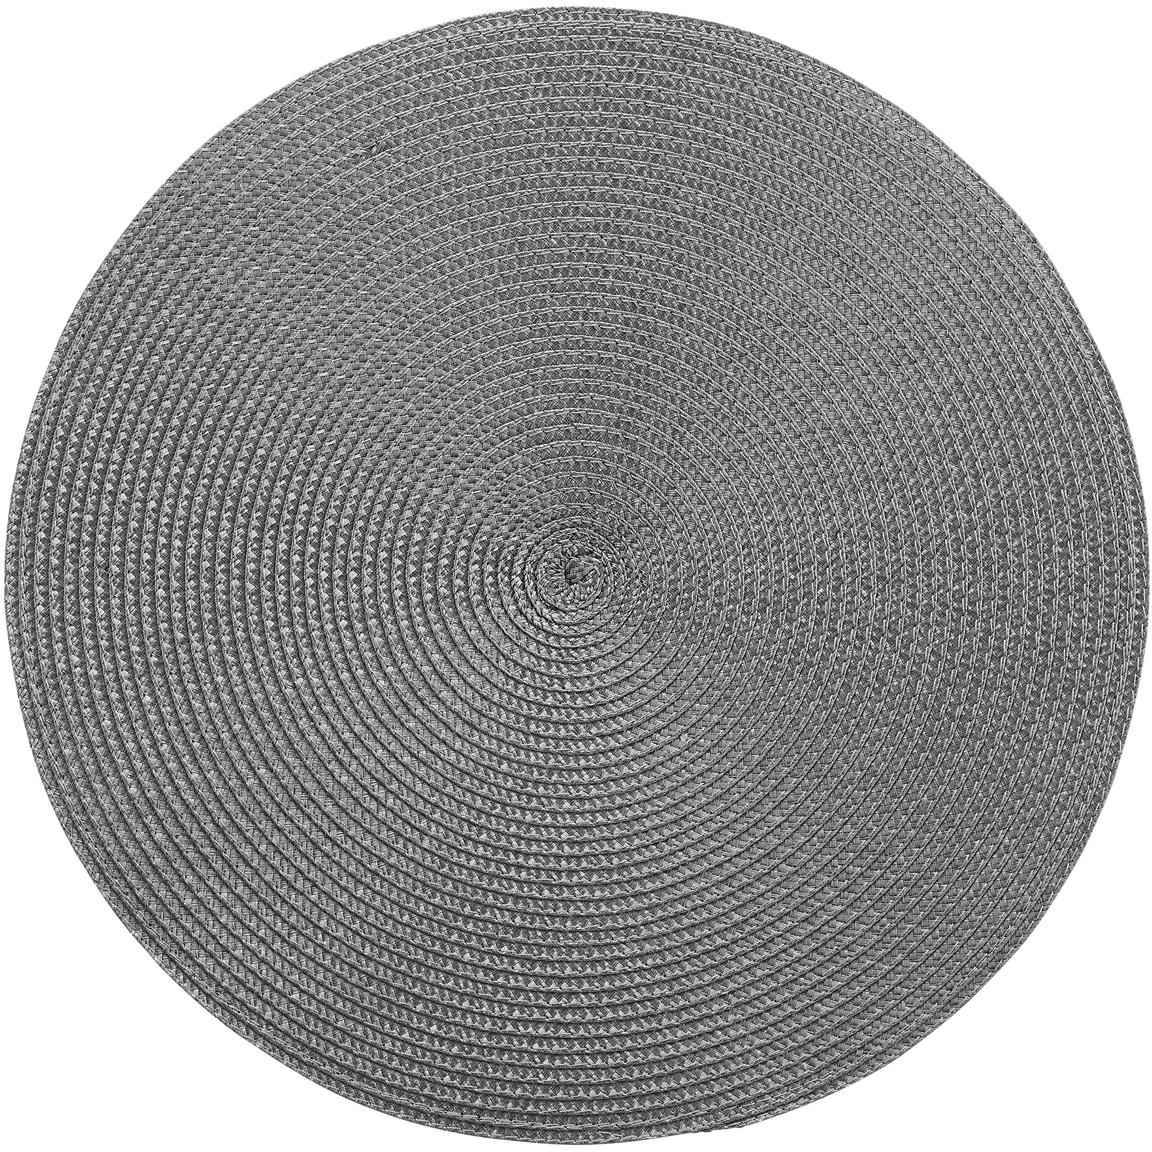 Runde Kunststoff Tischsets Ambiente, 2 Stück, Kunststoff, Dunkelgrau, Ø 38 cm